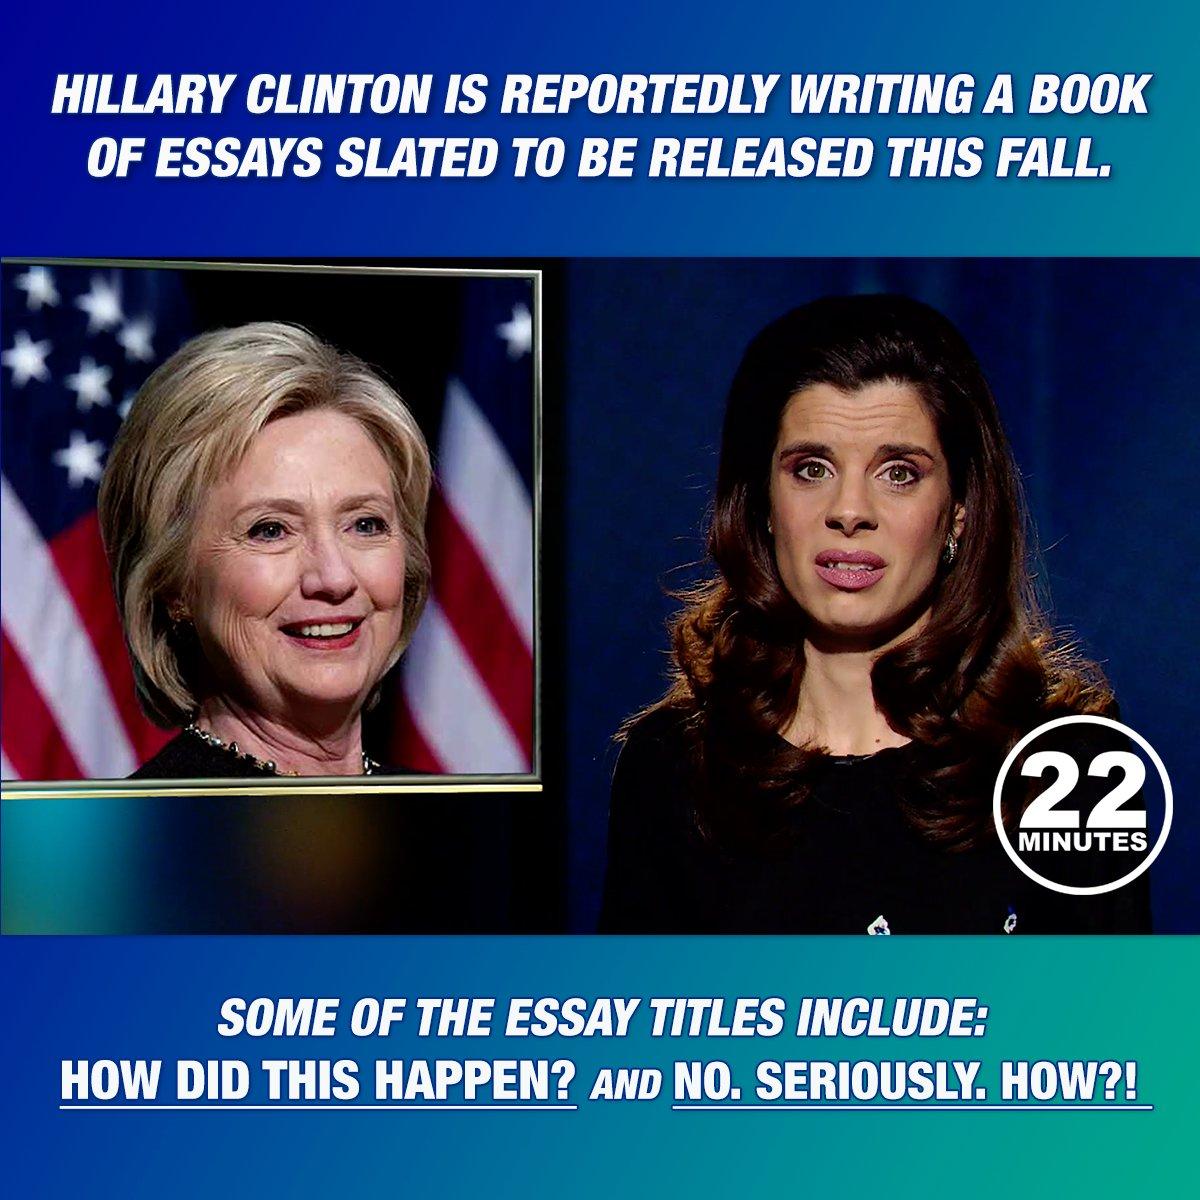 Anyone? #HillaryClinton #22minutes